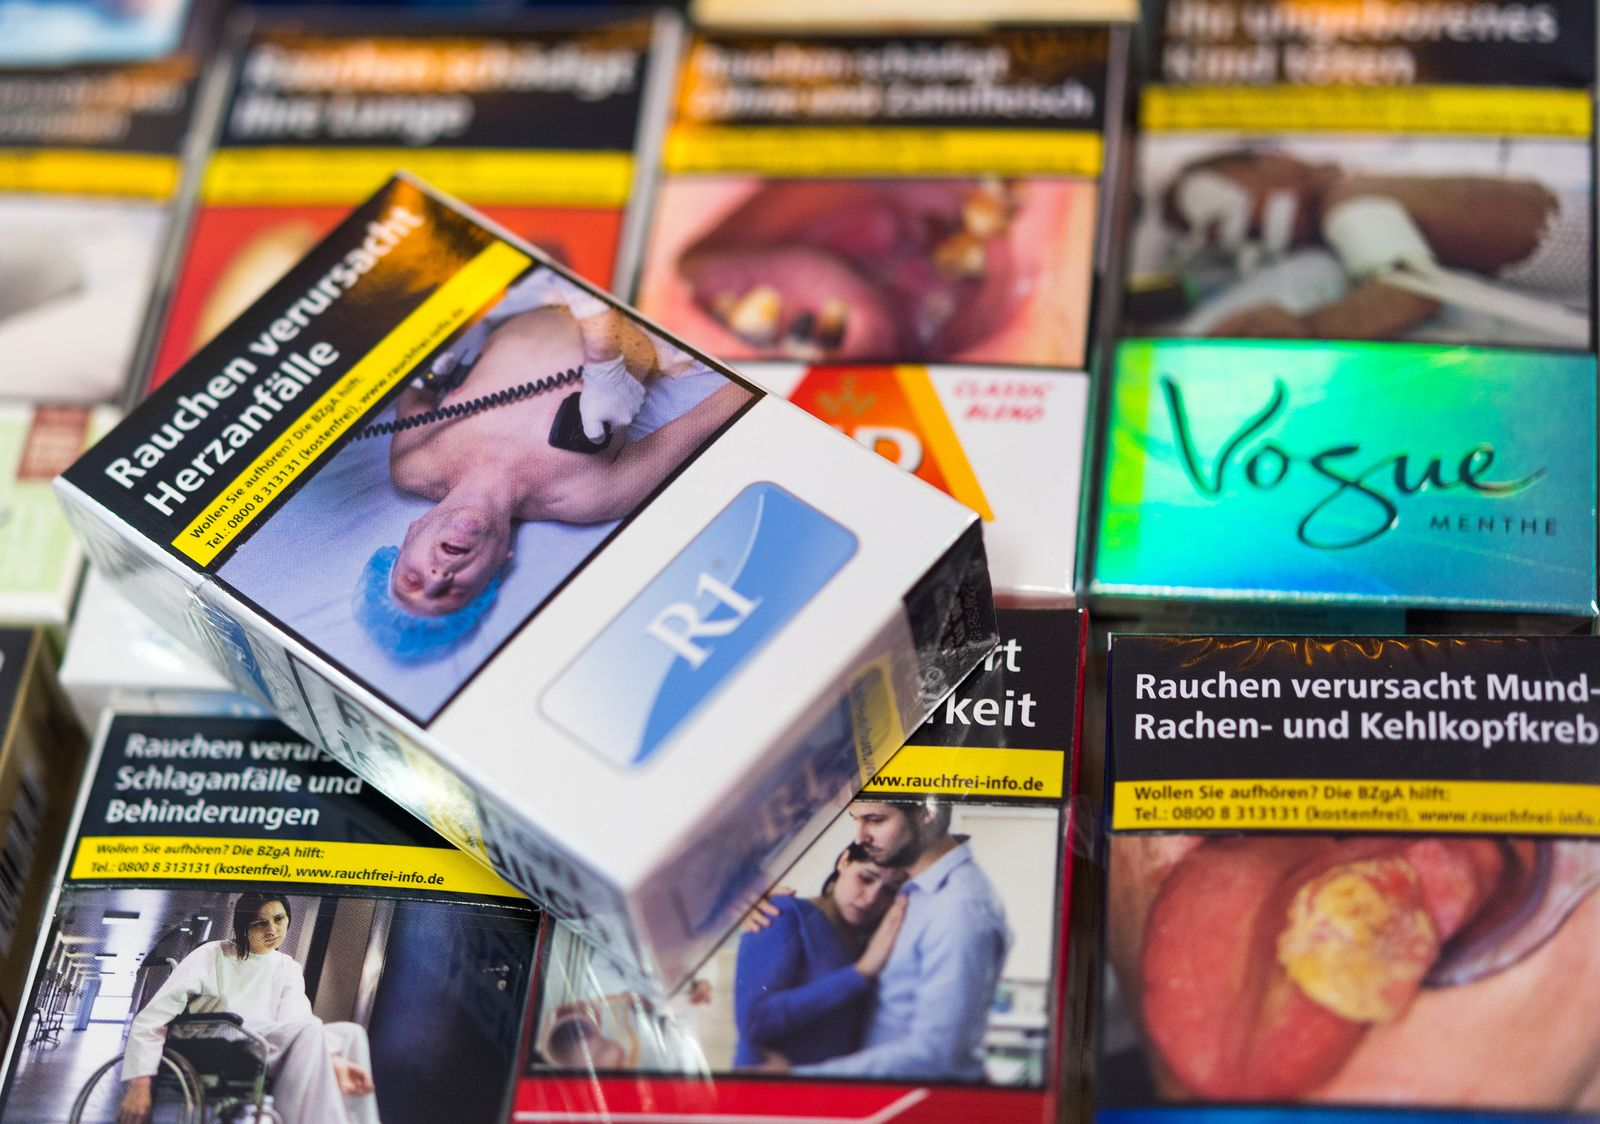 Schockbilder / Zigaretten/ Zigarettenschachteln